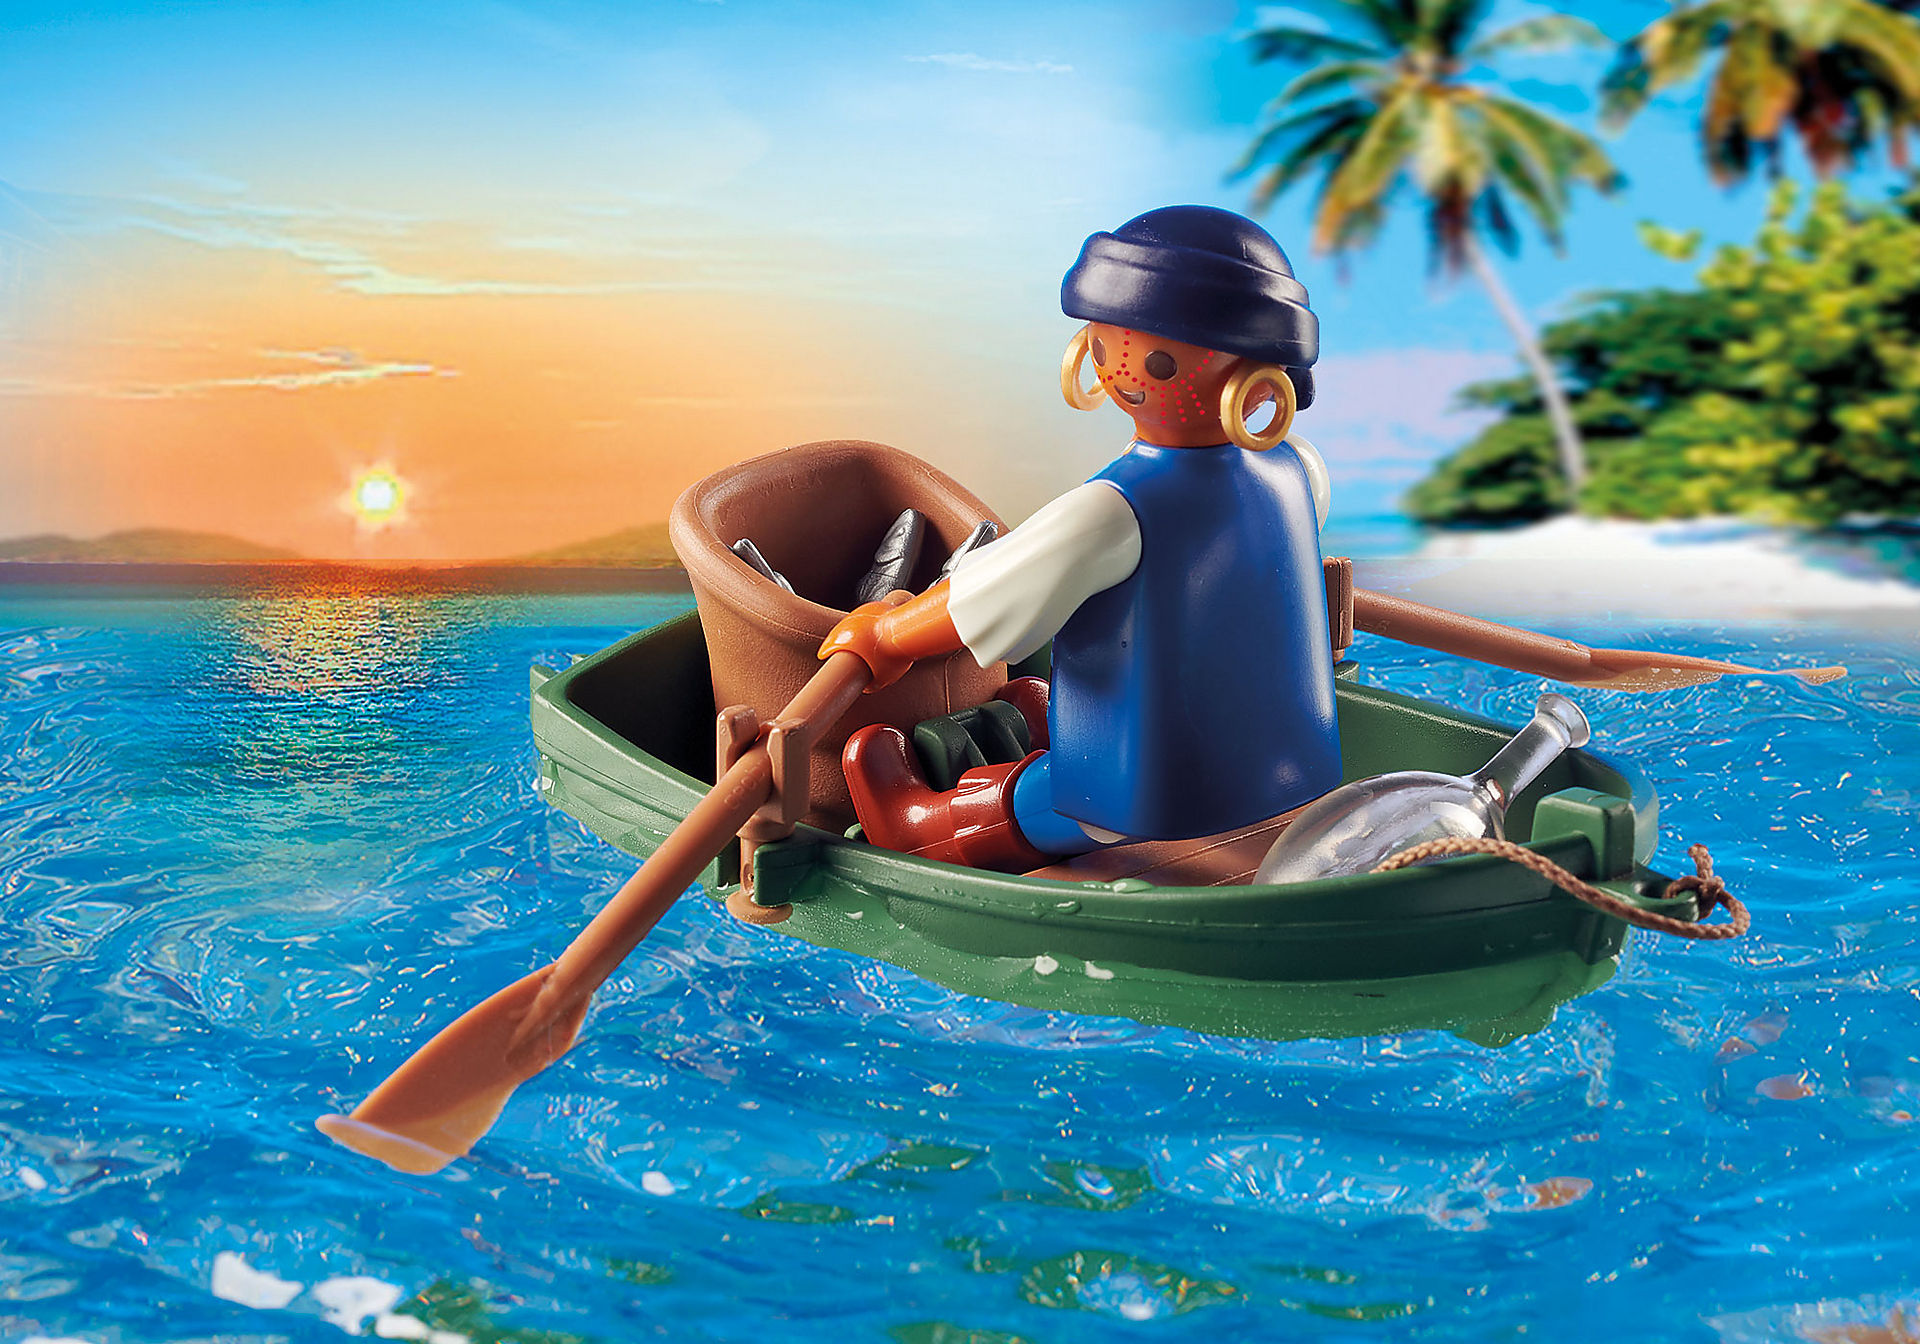 70150 Isla Pirata Maletín zoom image5